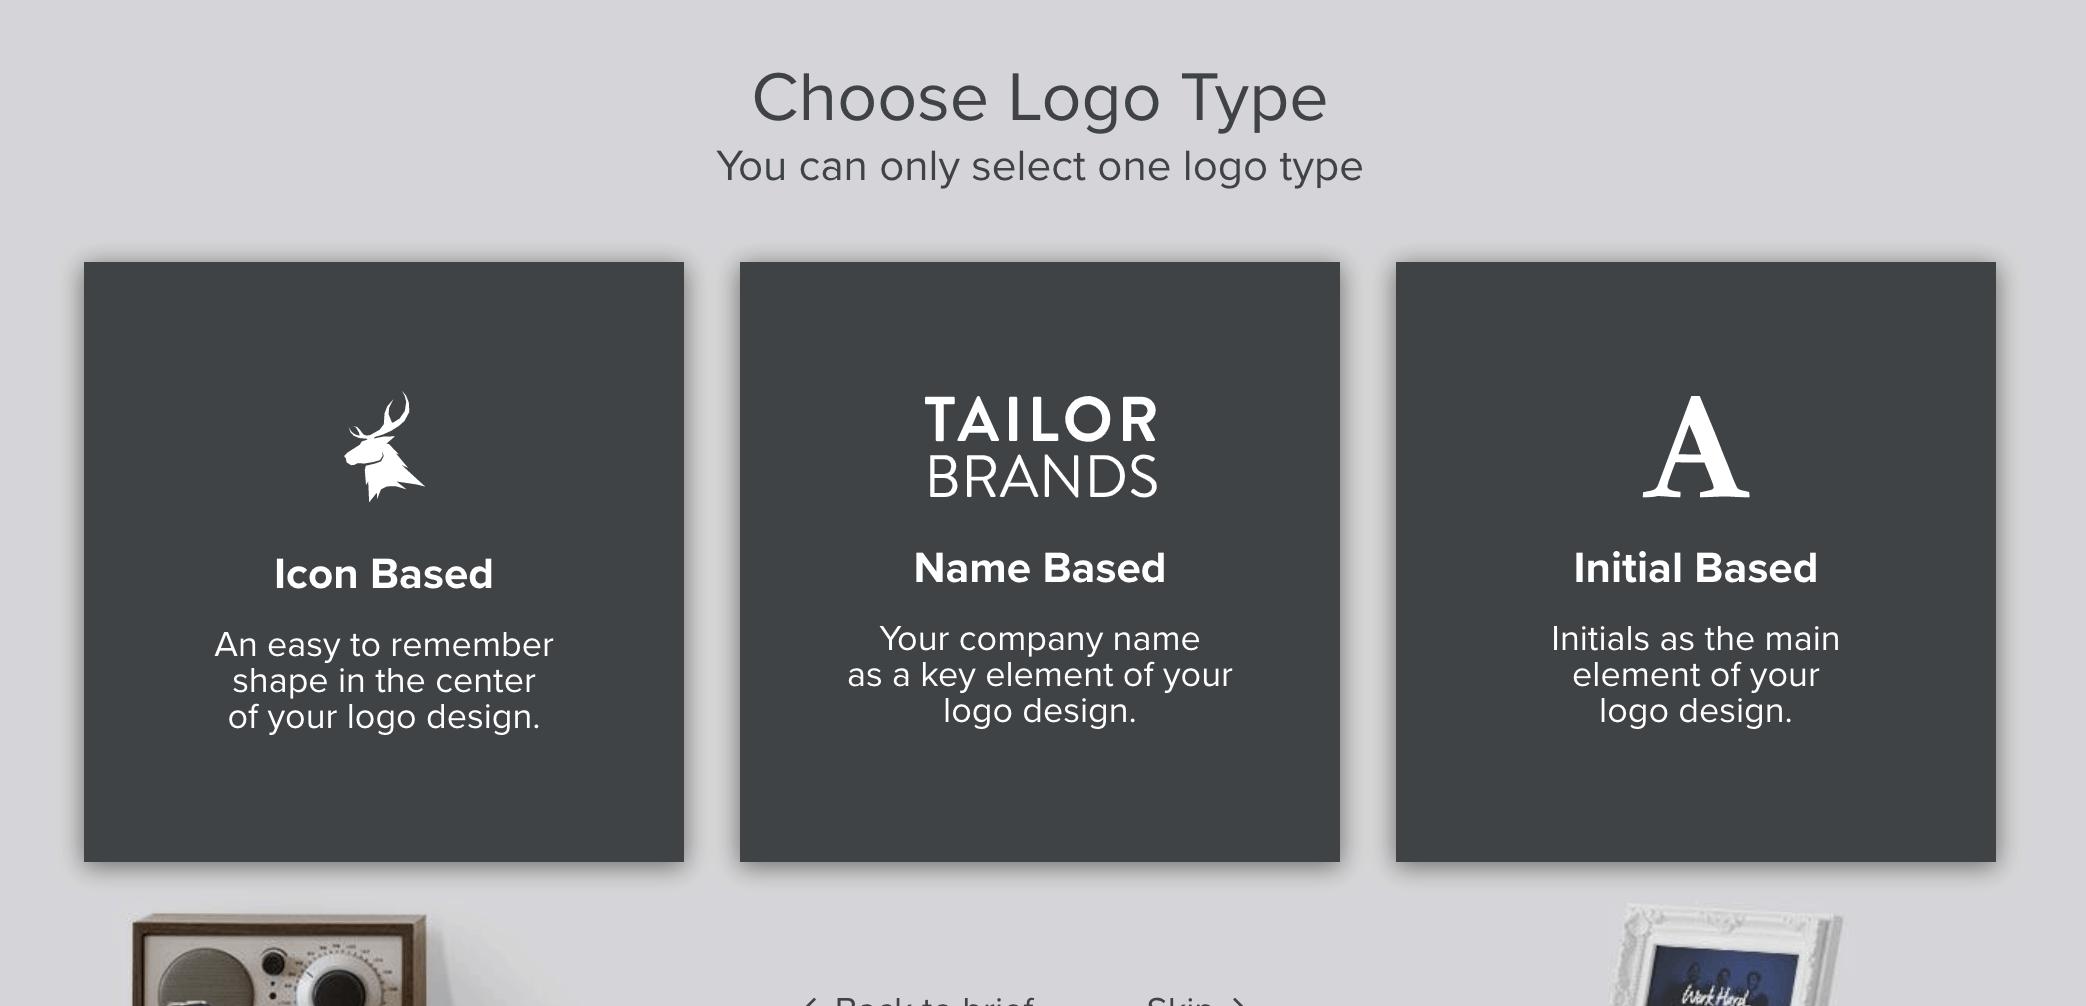 Tailor Brands screenshot - Choose Logo Type